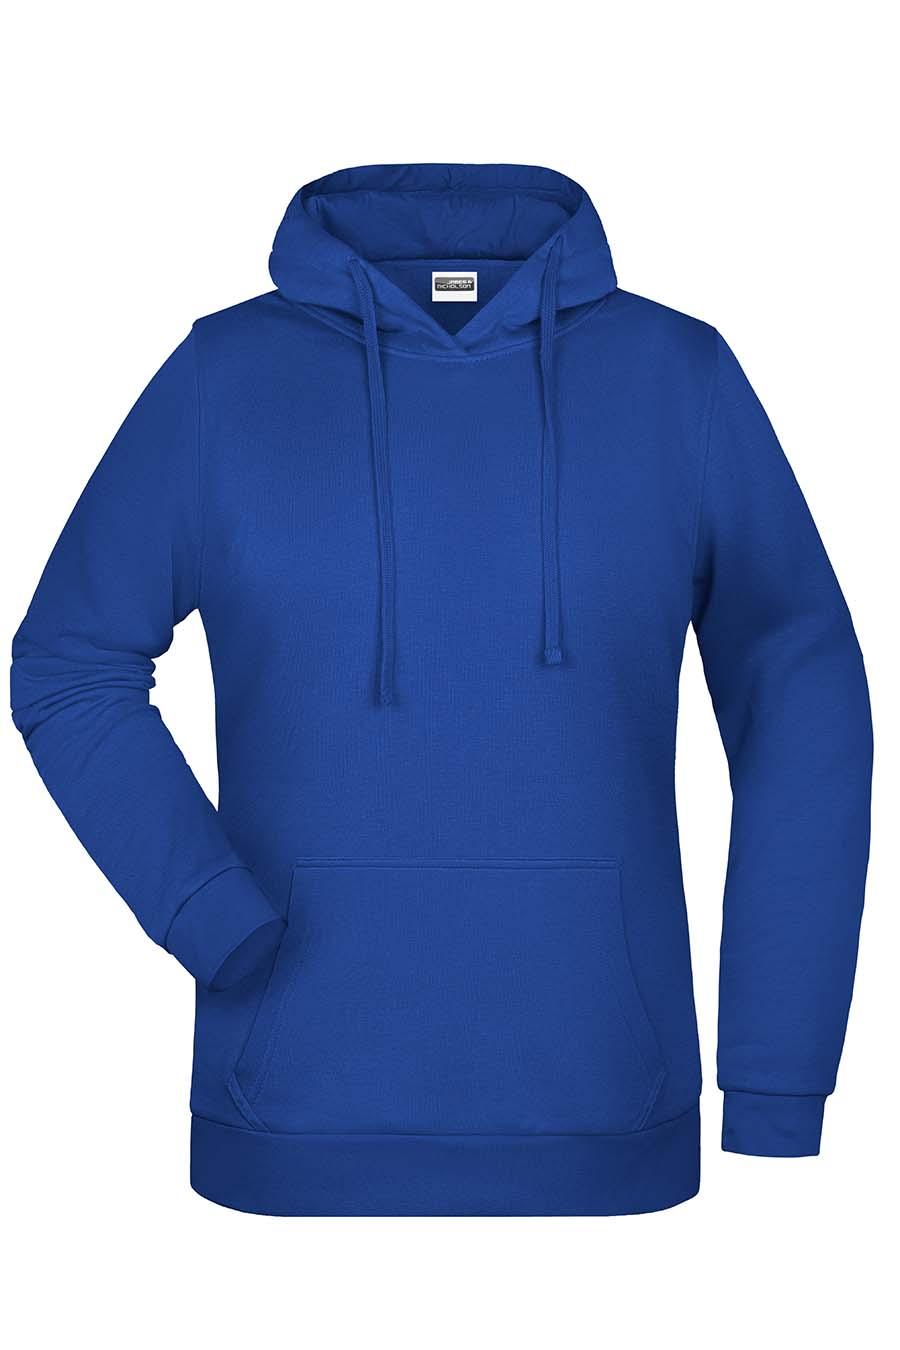 Sweat-shirt capuche femme - 20-1494-6